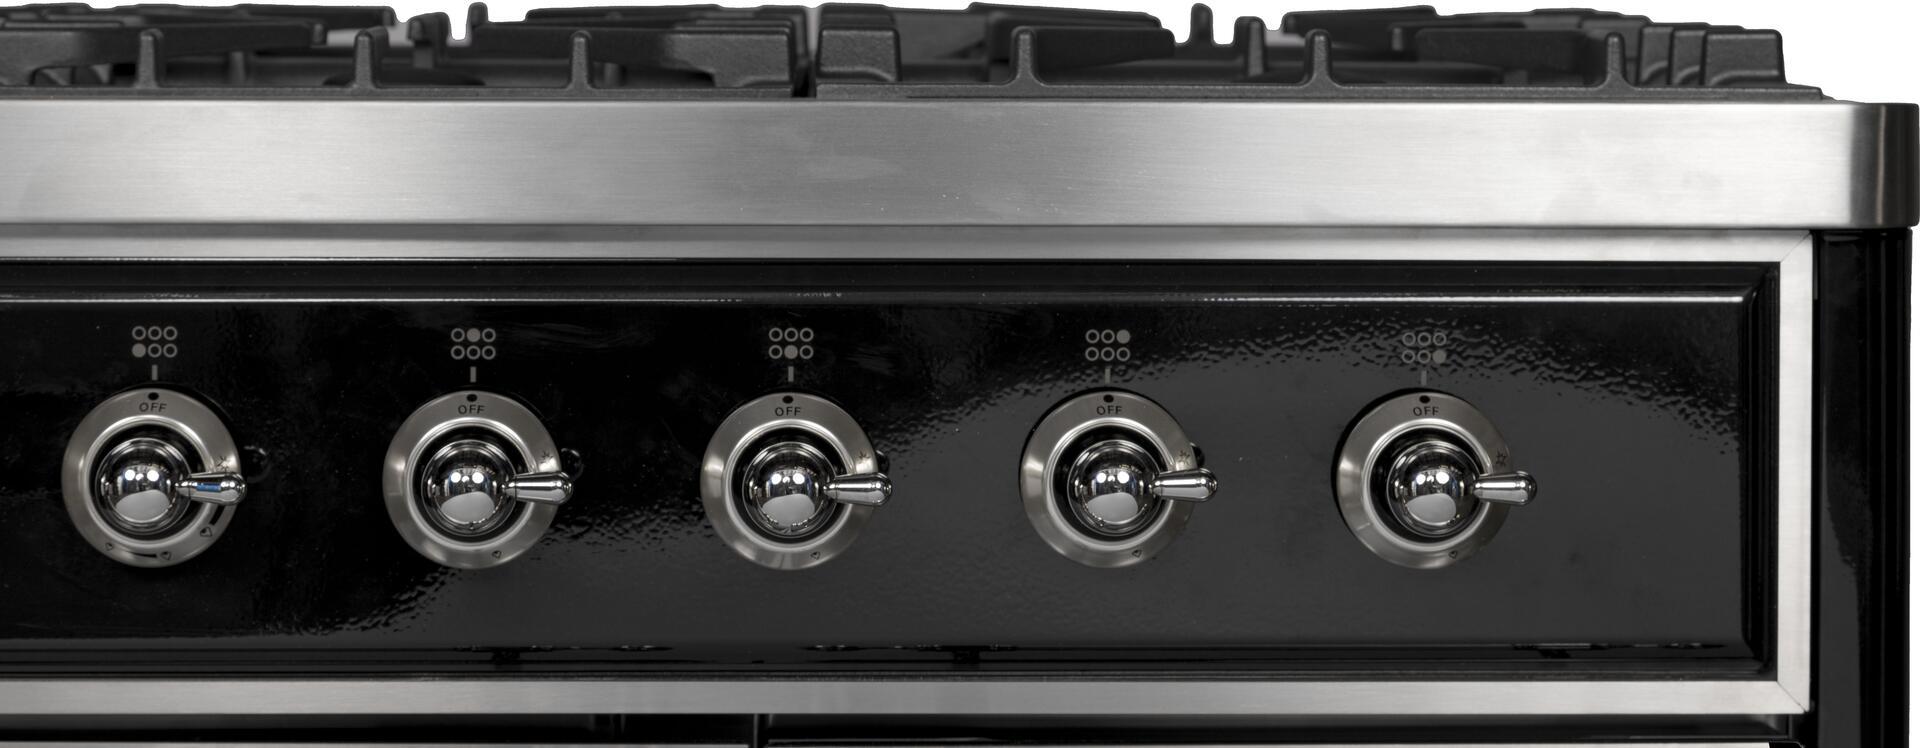 Ilve Majestic II UMD10FDNS3BKC Freestanding Dual Fuel Range Black, UMD10FDNS3BKC Close Up Details